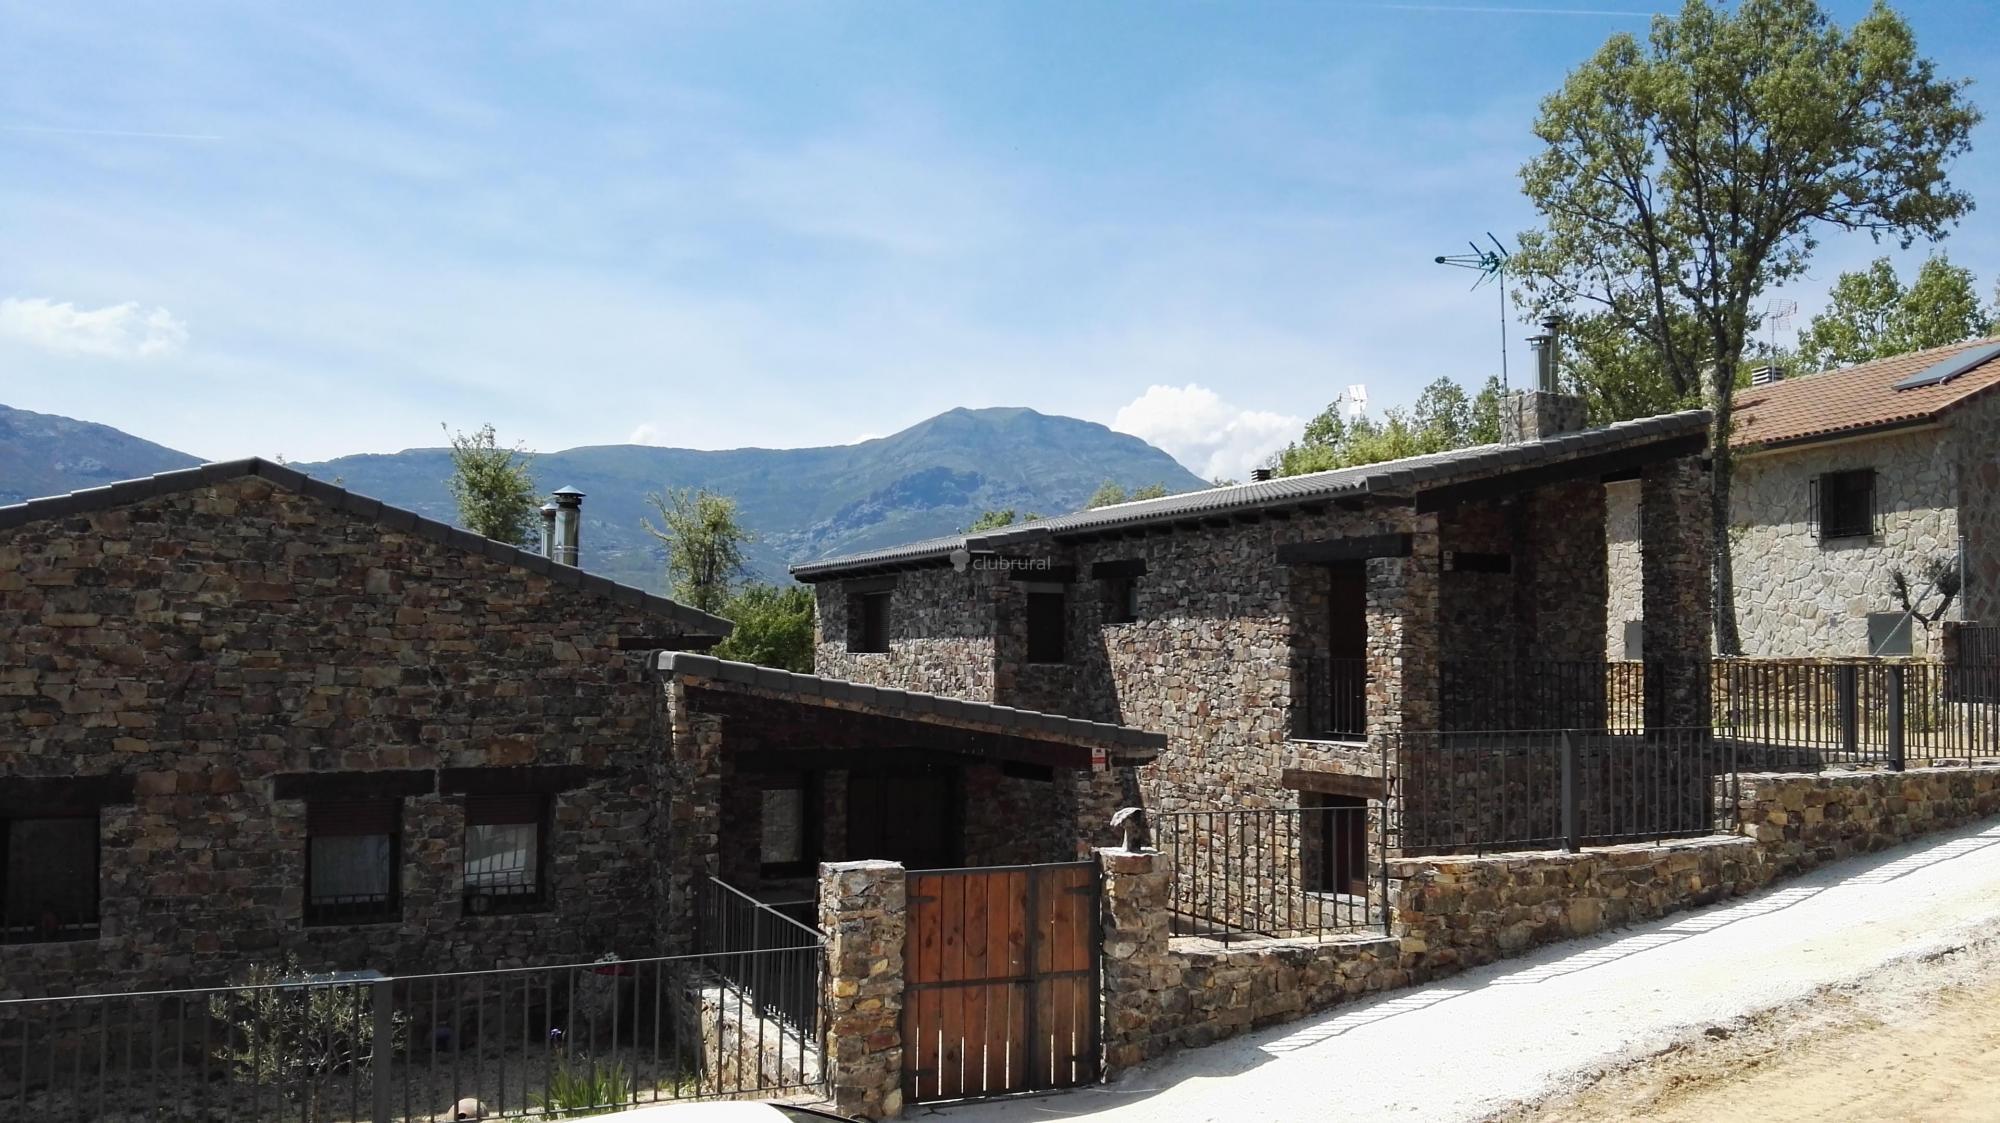 Fotos de casas rurales ocej n guadalajara palancares clubrural - Casas rurales guadalajara baratas ...